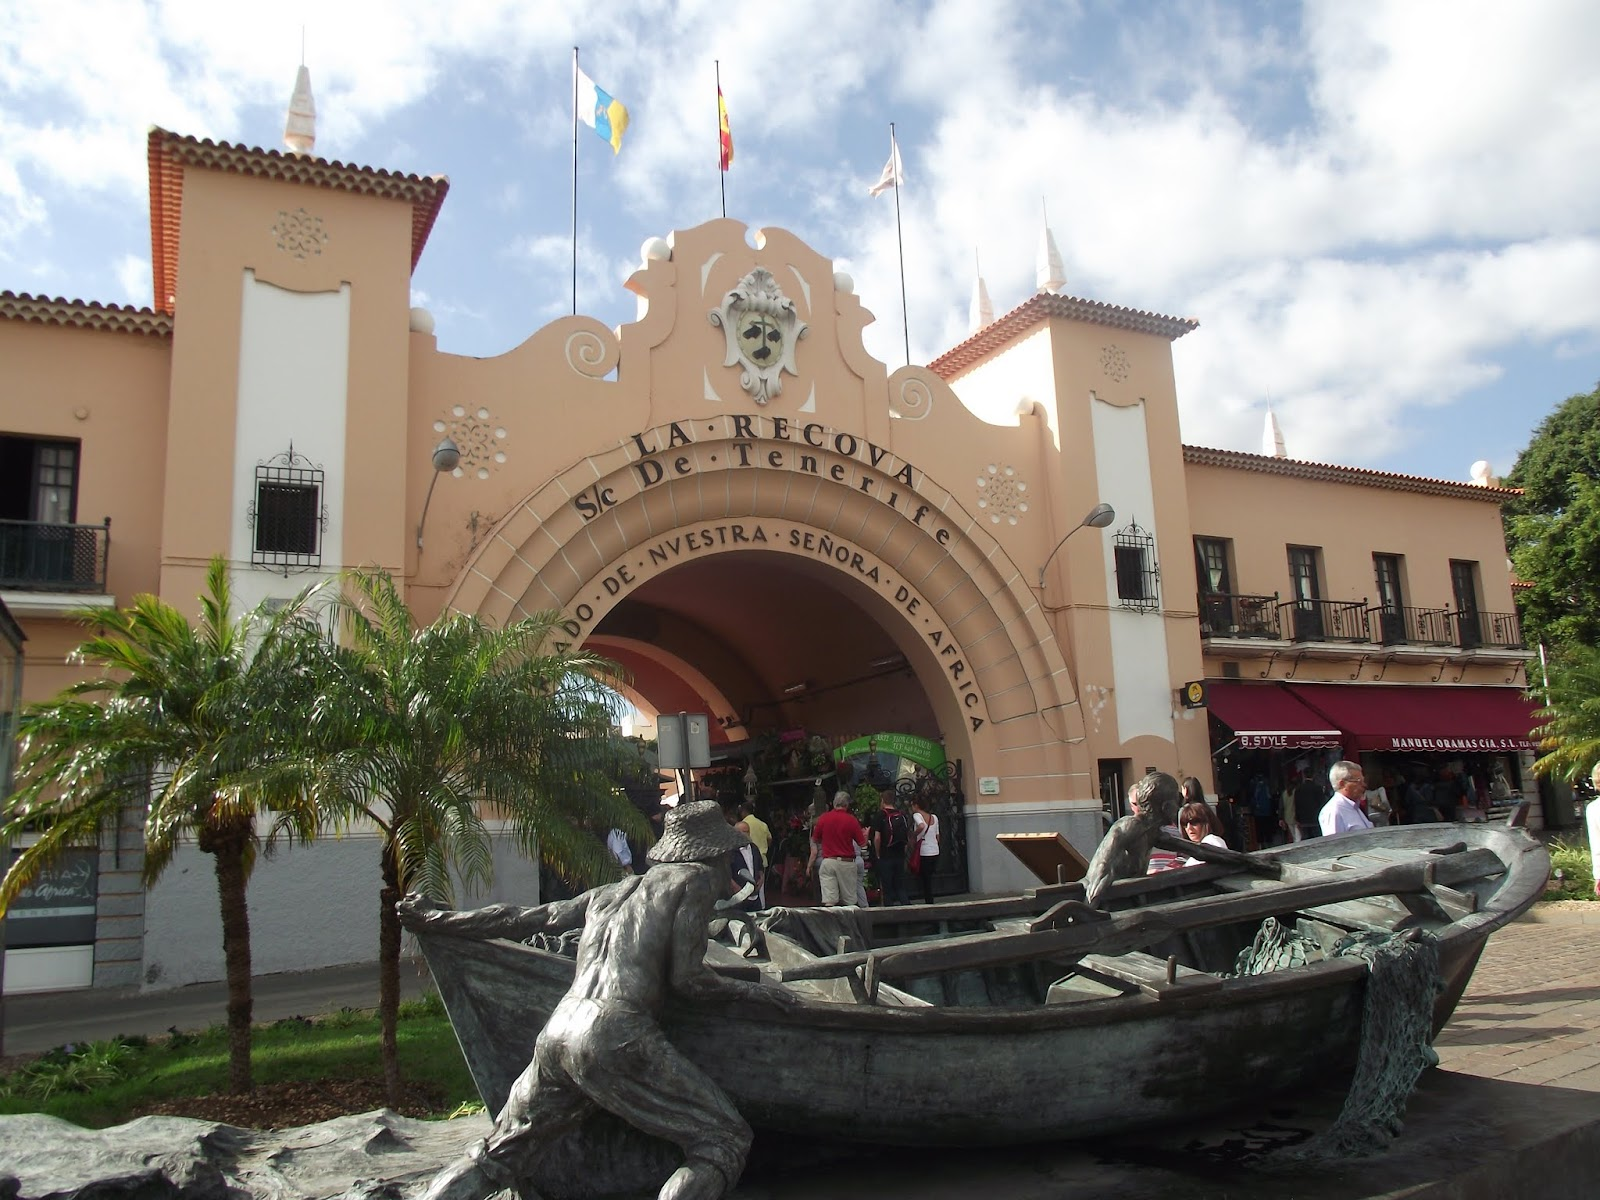 Mercado de África, Tenerife